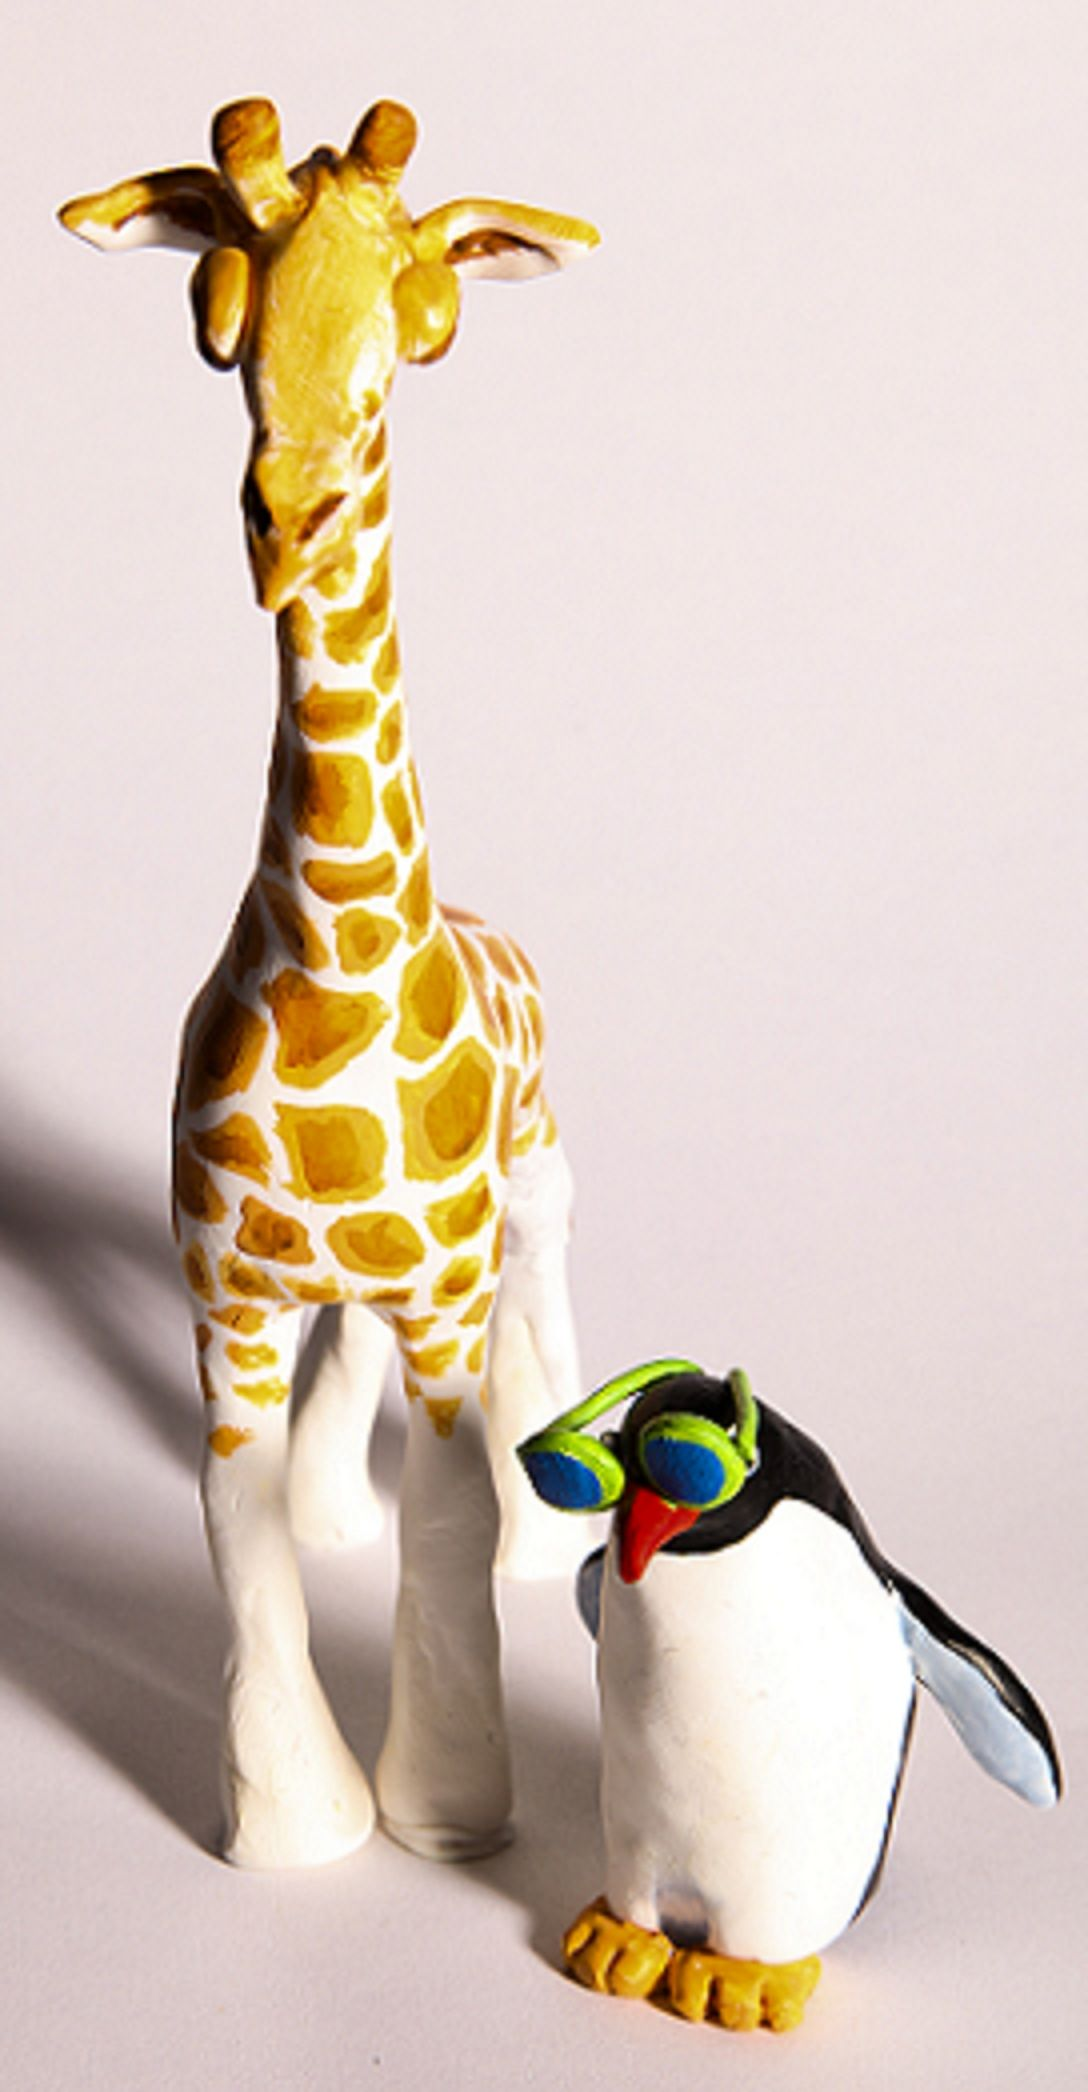 Giraffe Statue Sculpture FigurineHome Décor Available At - Sporting clay window decalsgiraffe garden statue giraffe clay pot clay pot animal